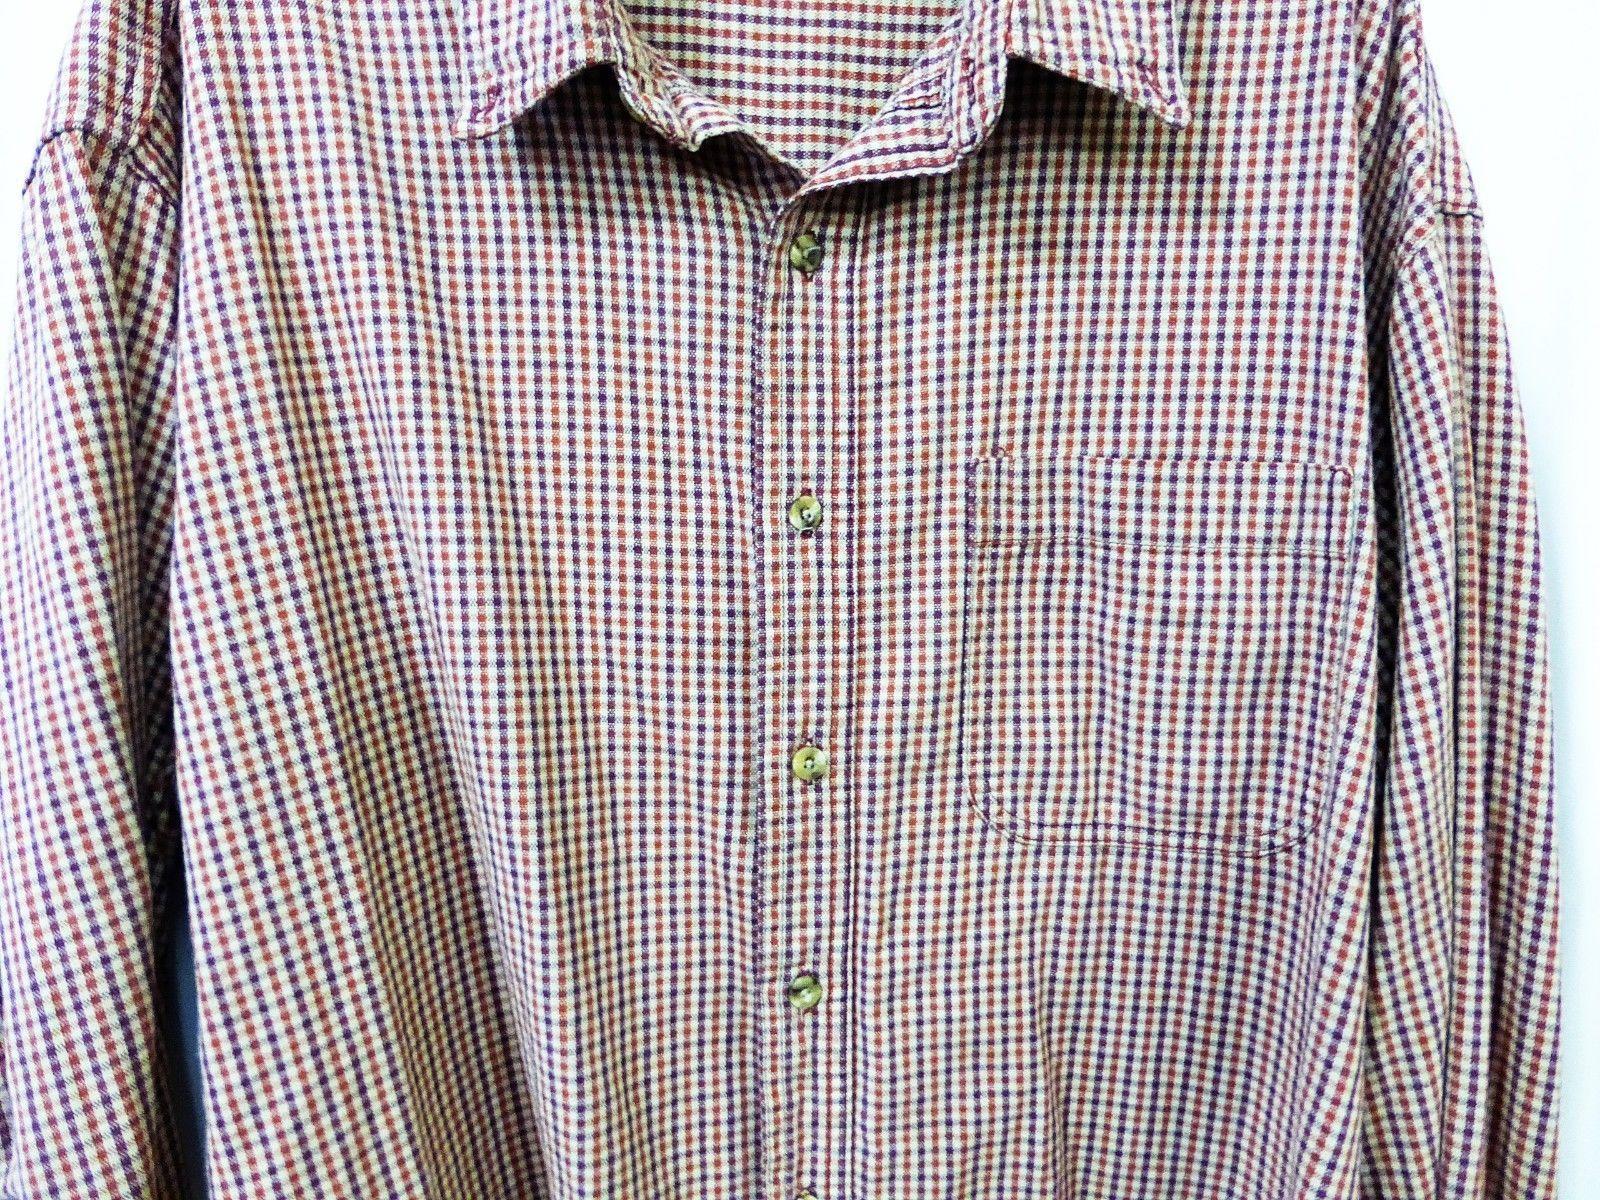 L.L. Bean long sleeve shirt men button down XL/XLarge plaid 100% cotton